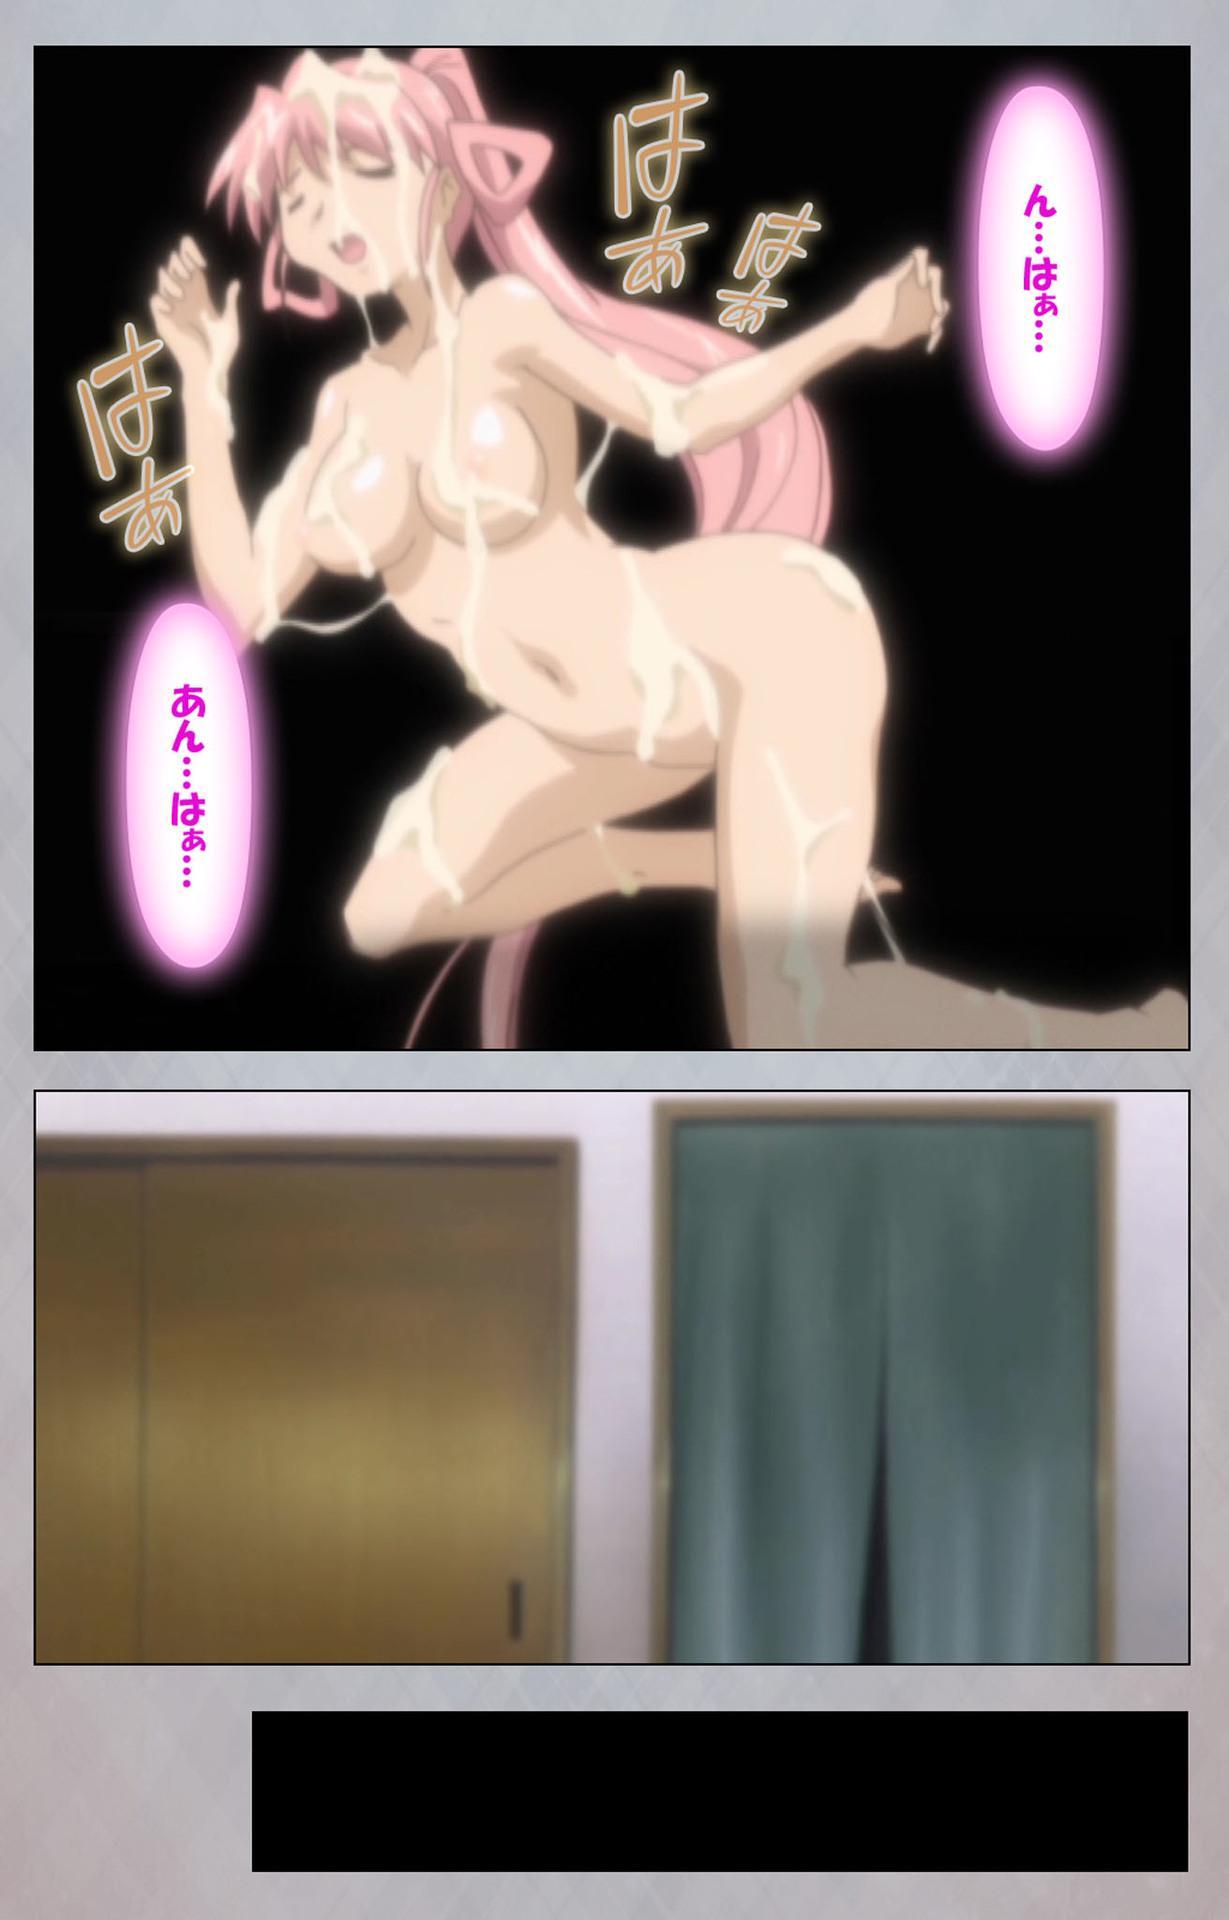 [Digital Works] [Full Color Seijin Ban] Sex Android ~Risou no Onna de Nuite yaru~ Kanzenban 148